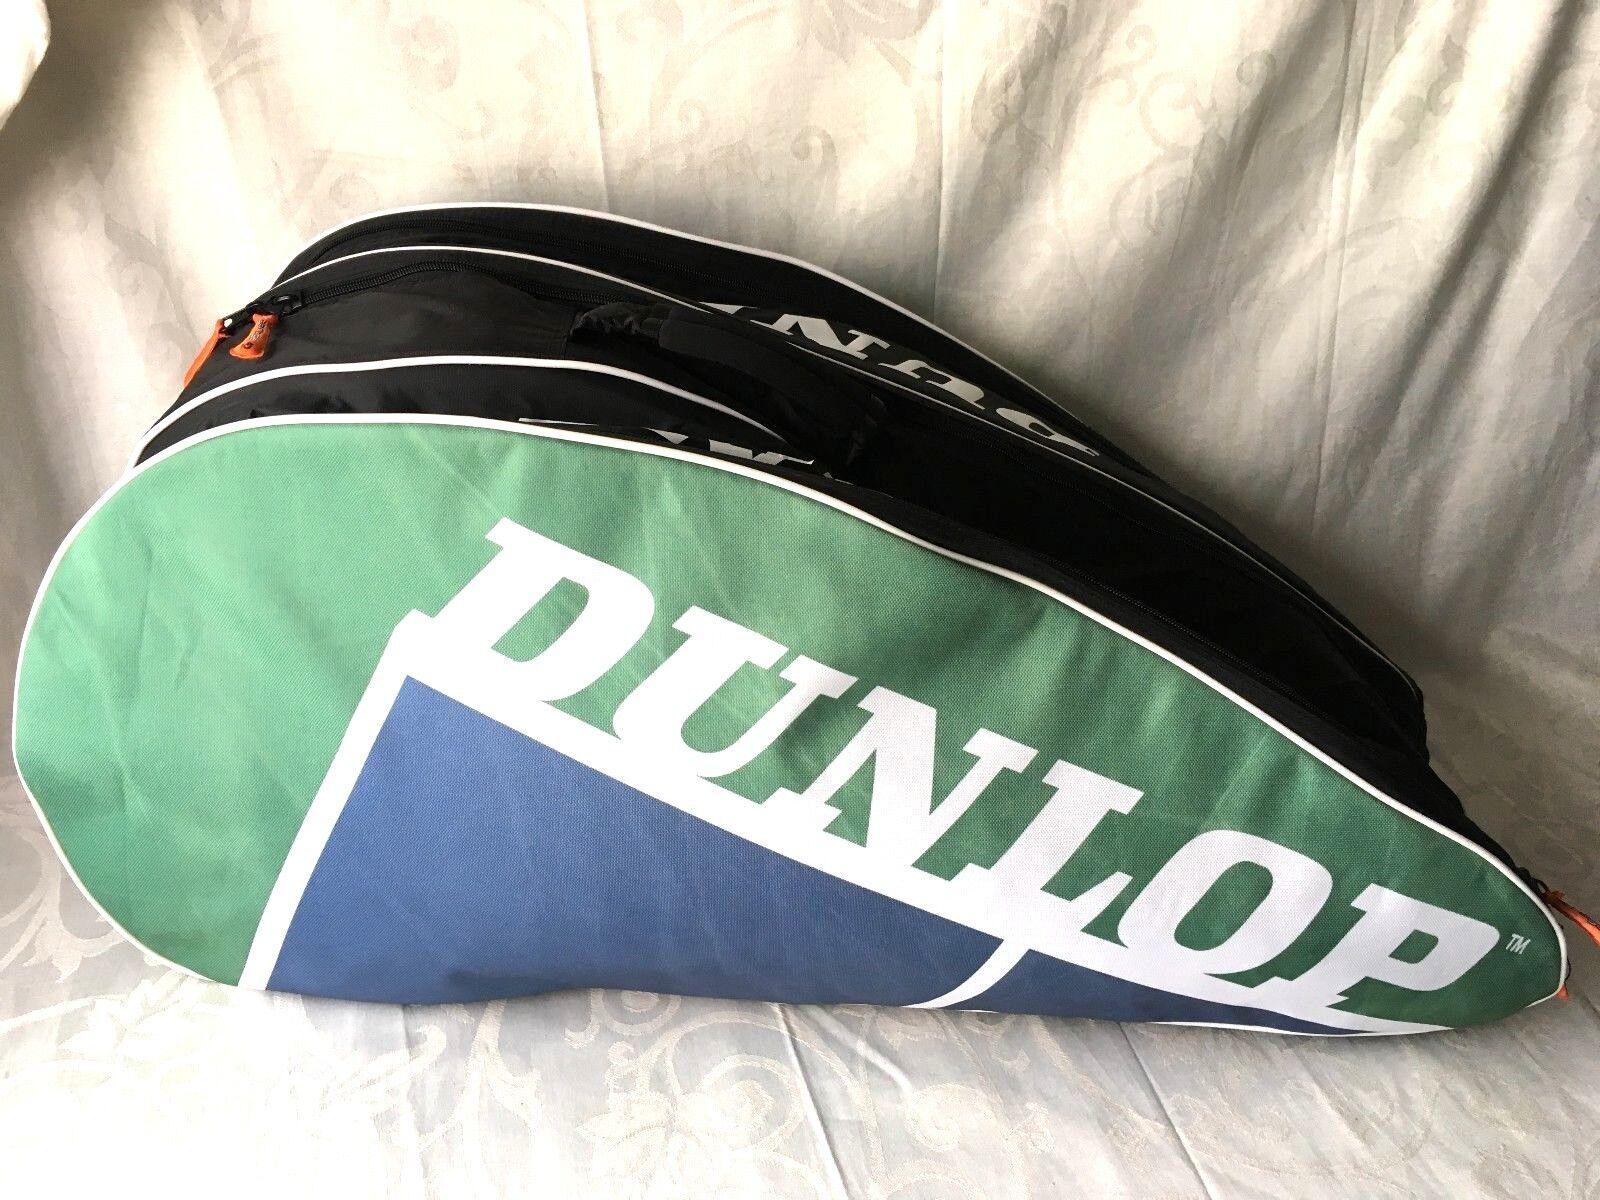 Dunlop 3 vano 12 Racchetta da Tennis Tennis da Borsa Termica Zaino R282 11511f